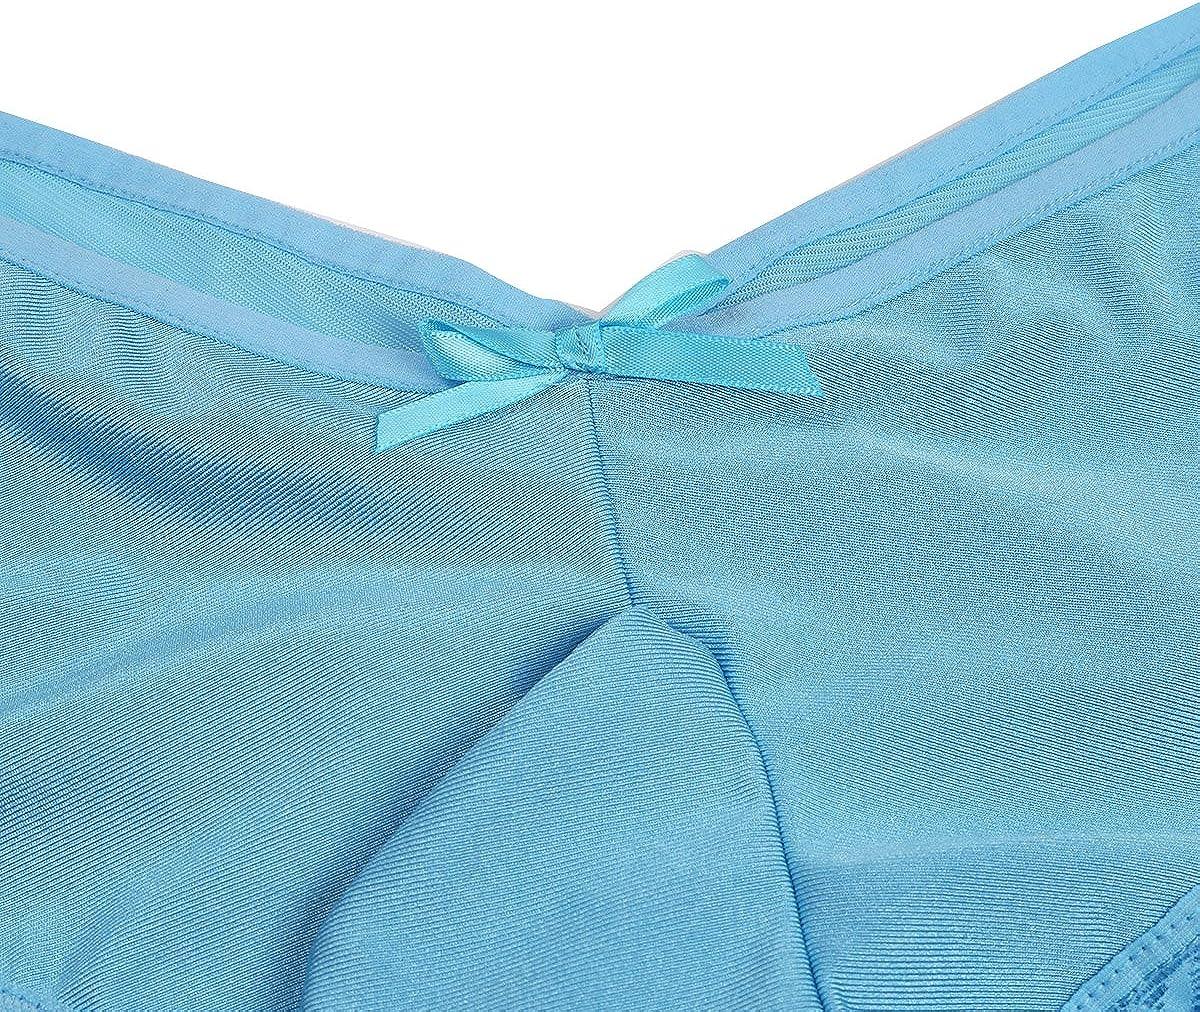 MSemis Men Sissy Satin Panties Underwear Lace Criss Cross Back Bikini Tong Briefs G-String Lingerie